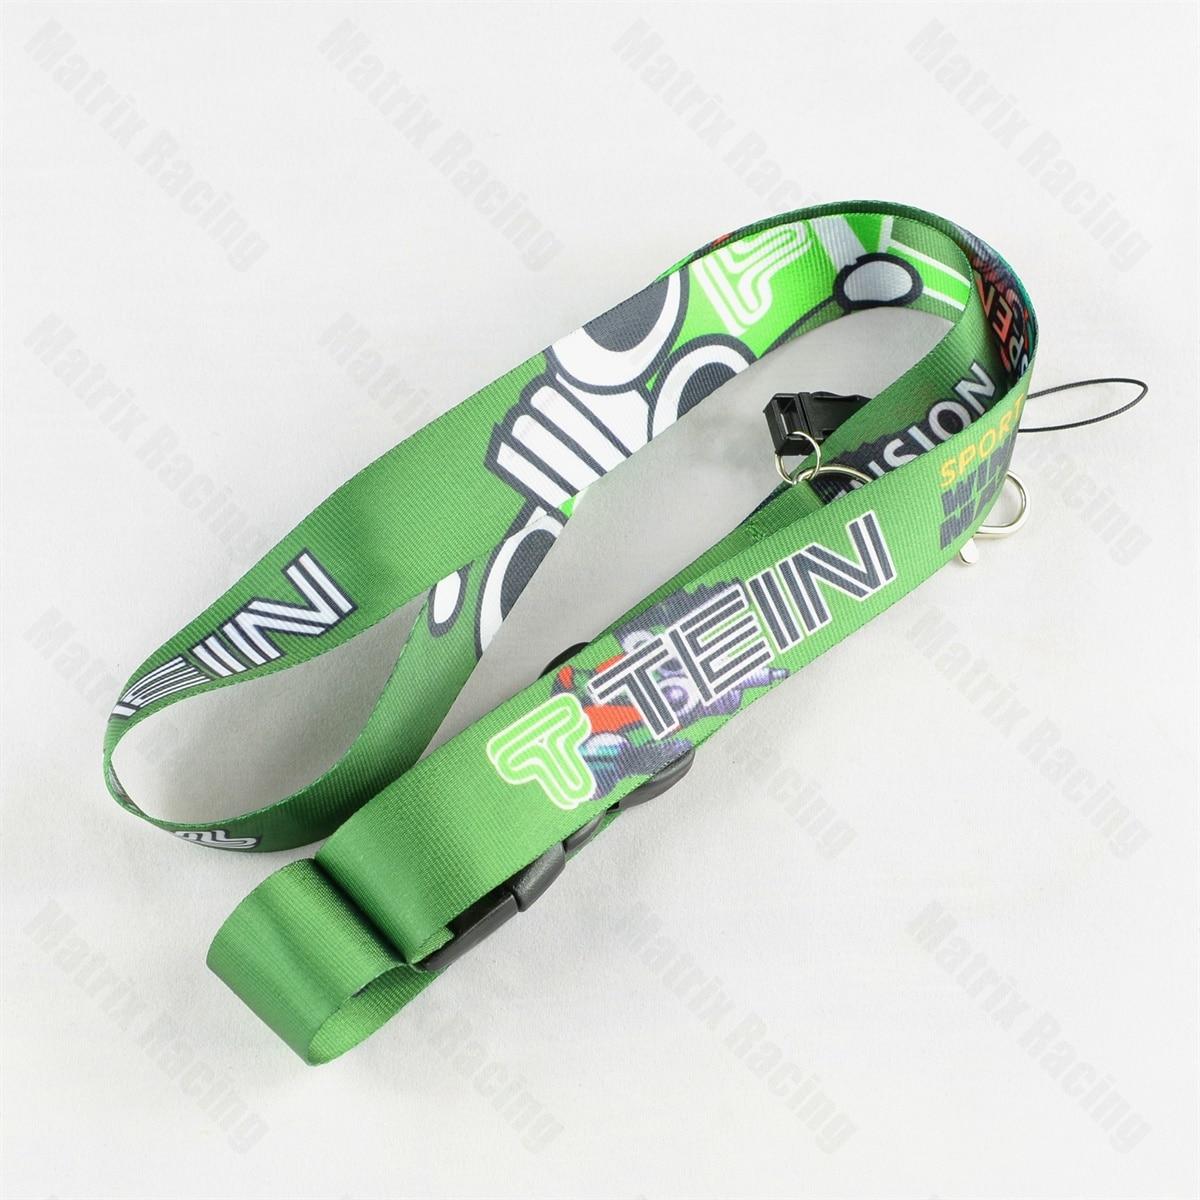 JDM Style for Ferrari Car Logo Cellphone Lanyard JDM Racing Car Keychain ID Holder Mobile Neck Strap with Quick Release for 488 Pista Portofino 812 458 Black